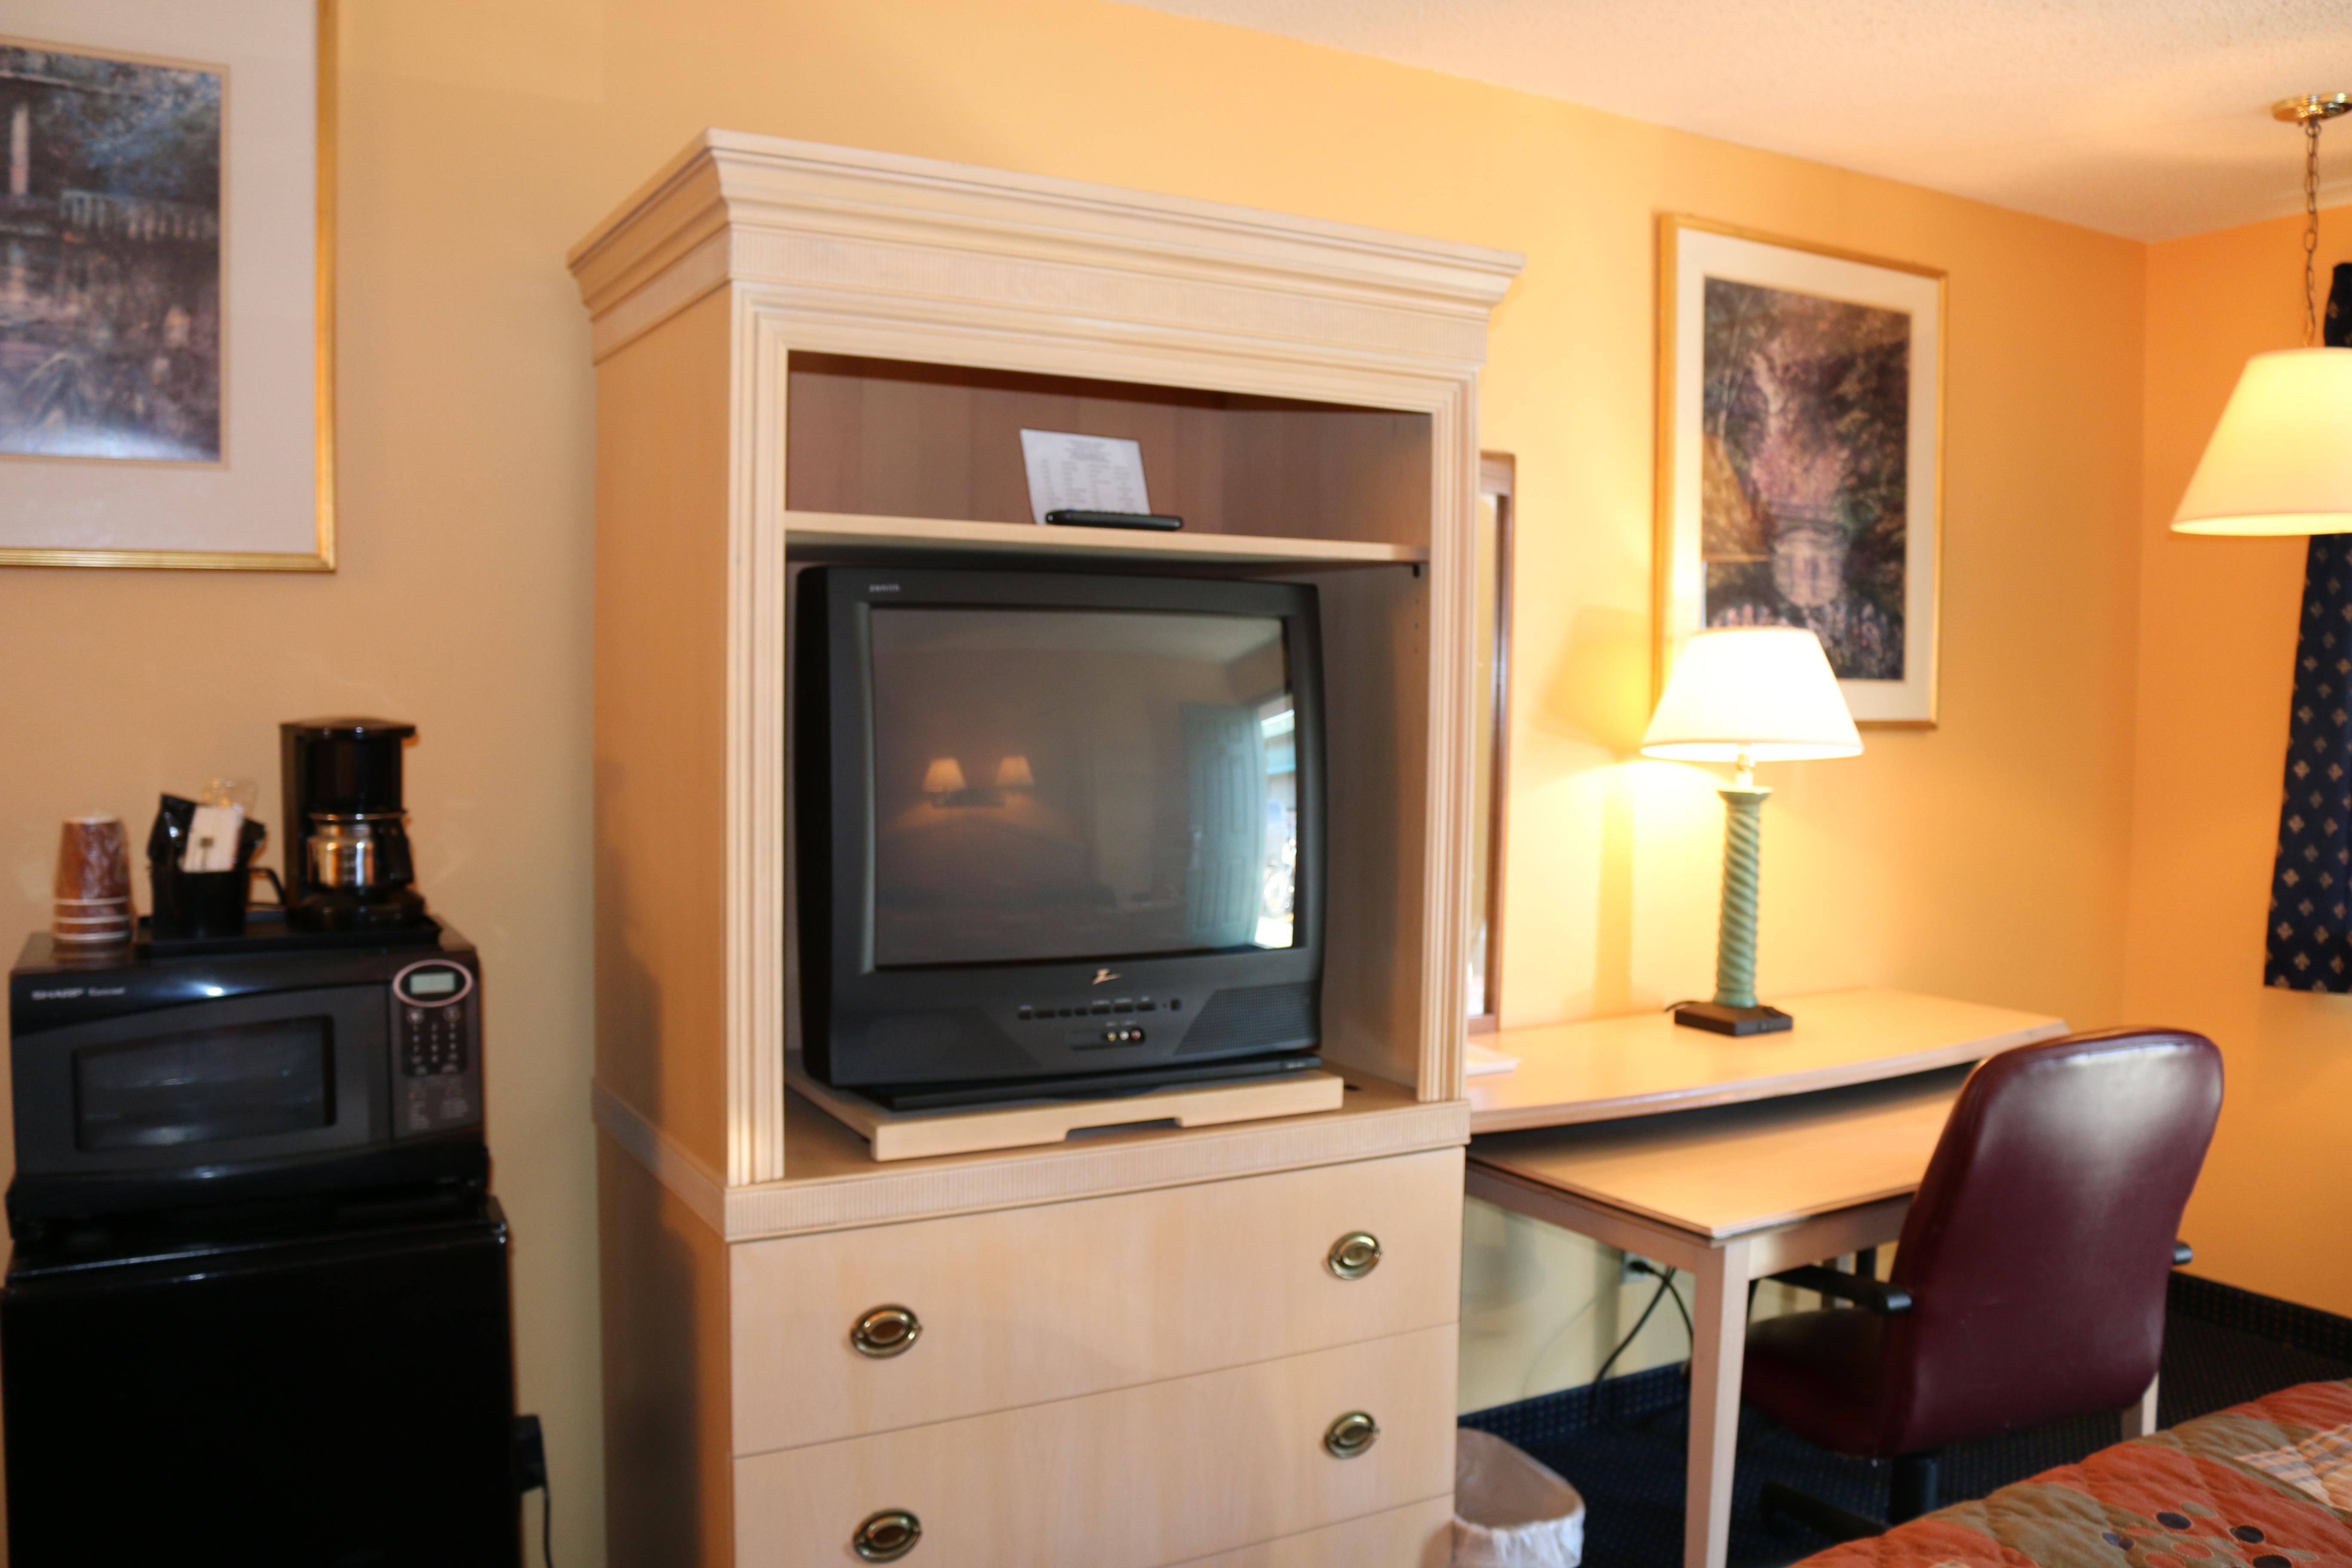 Canterbury Inn & Suites, Parsons KS